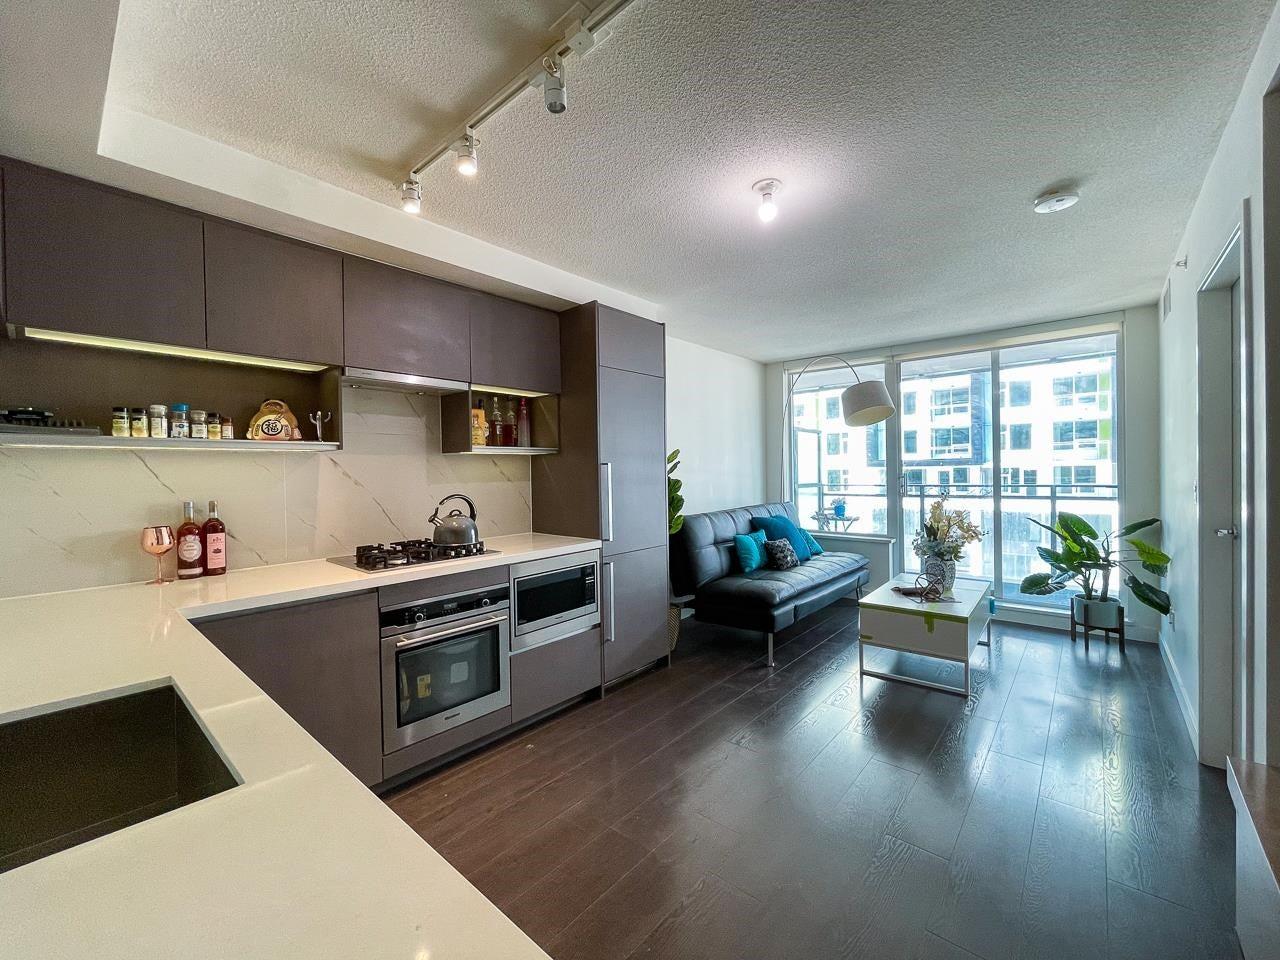 706 8833 HAZELBRIDGE WAY - West Cambie Apartment/Condo for sale, 1 Bedroom (R2604760)